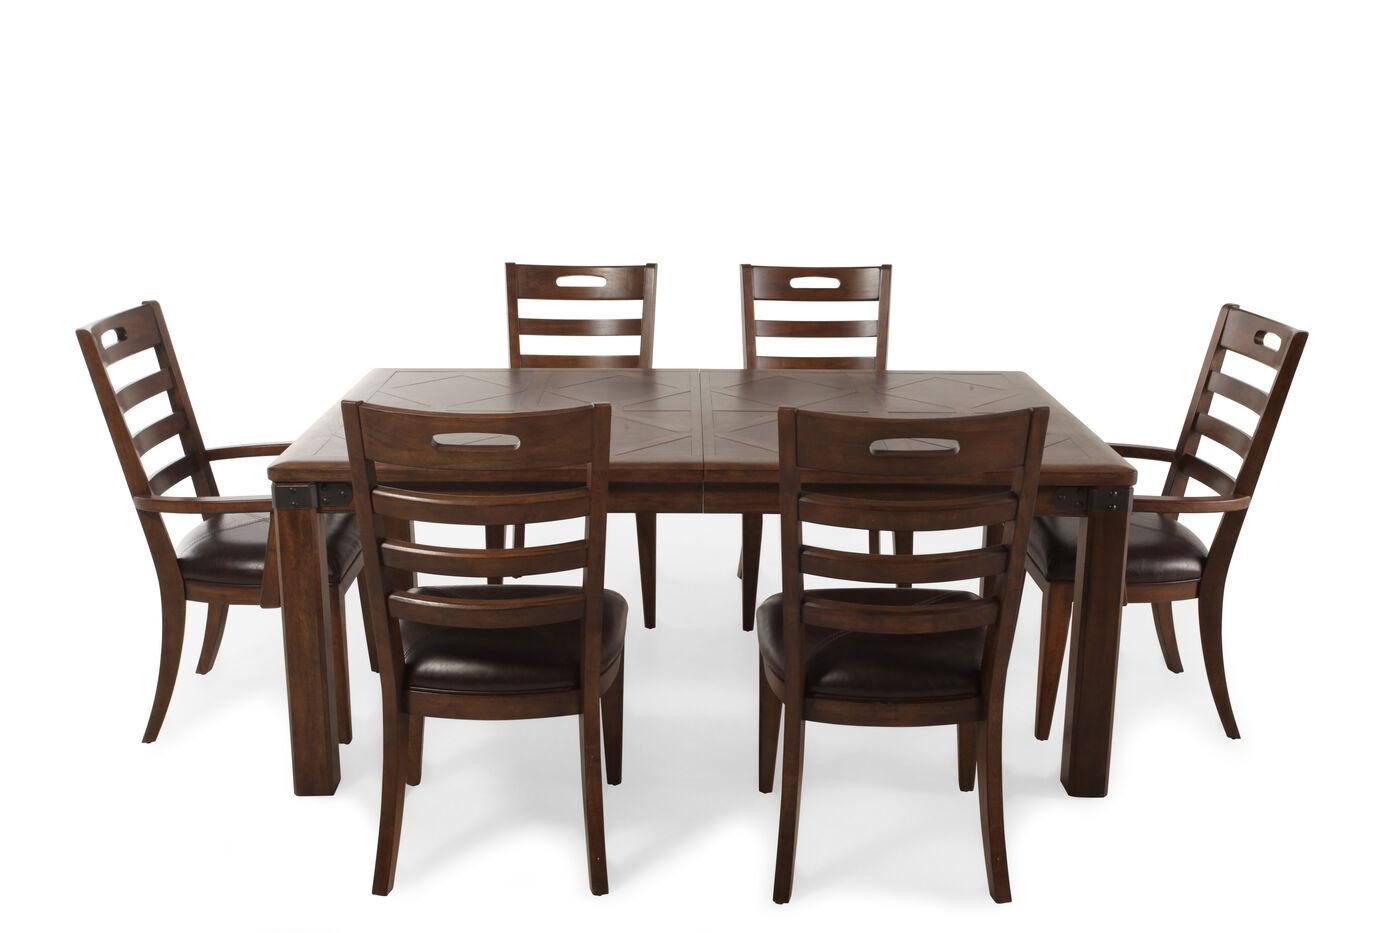 pulaski heartland falls seven piece dining set : seven piece dining set